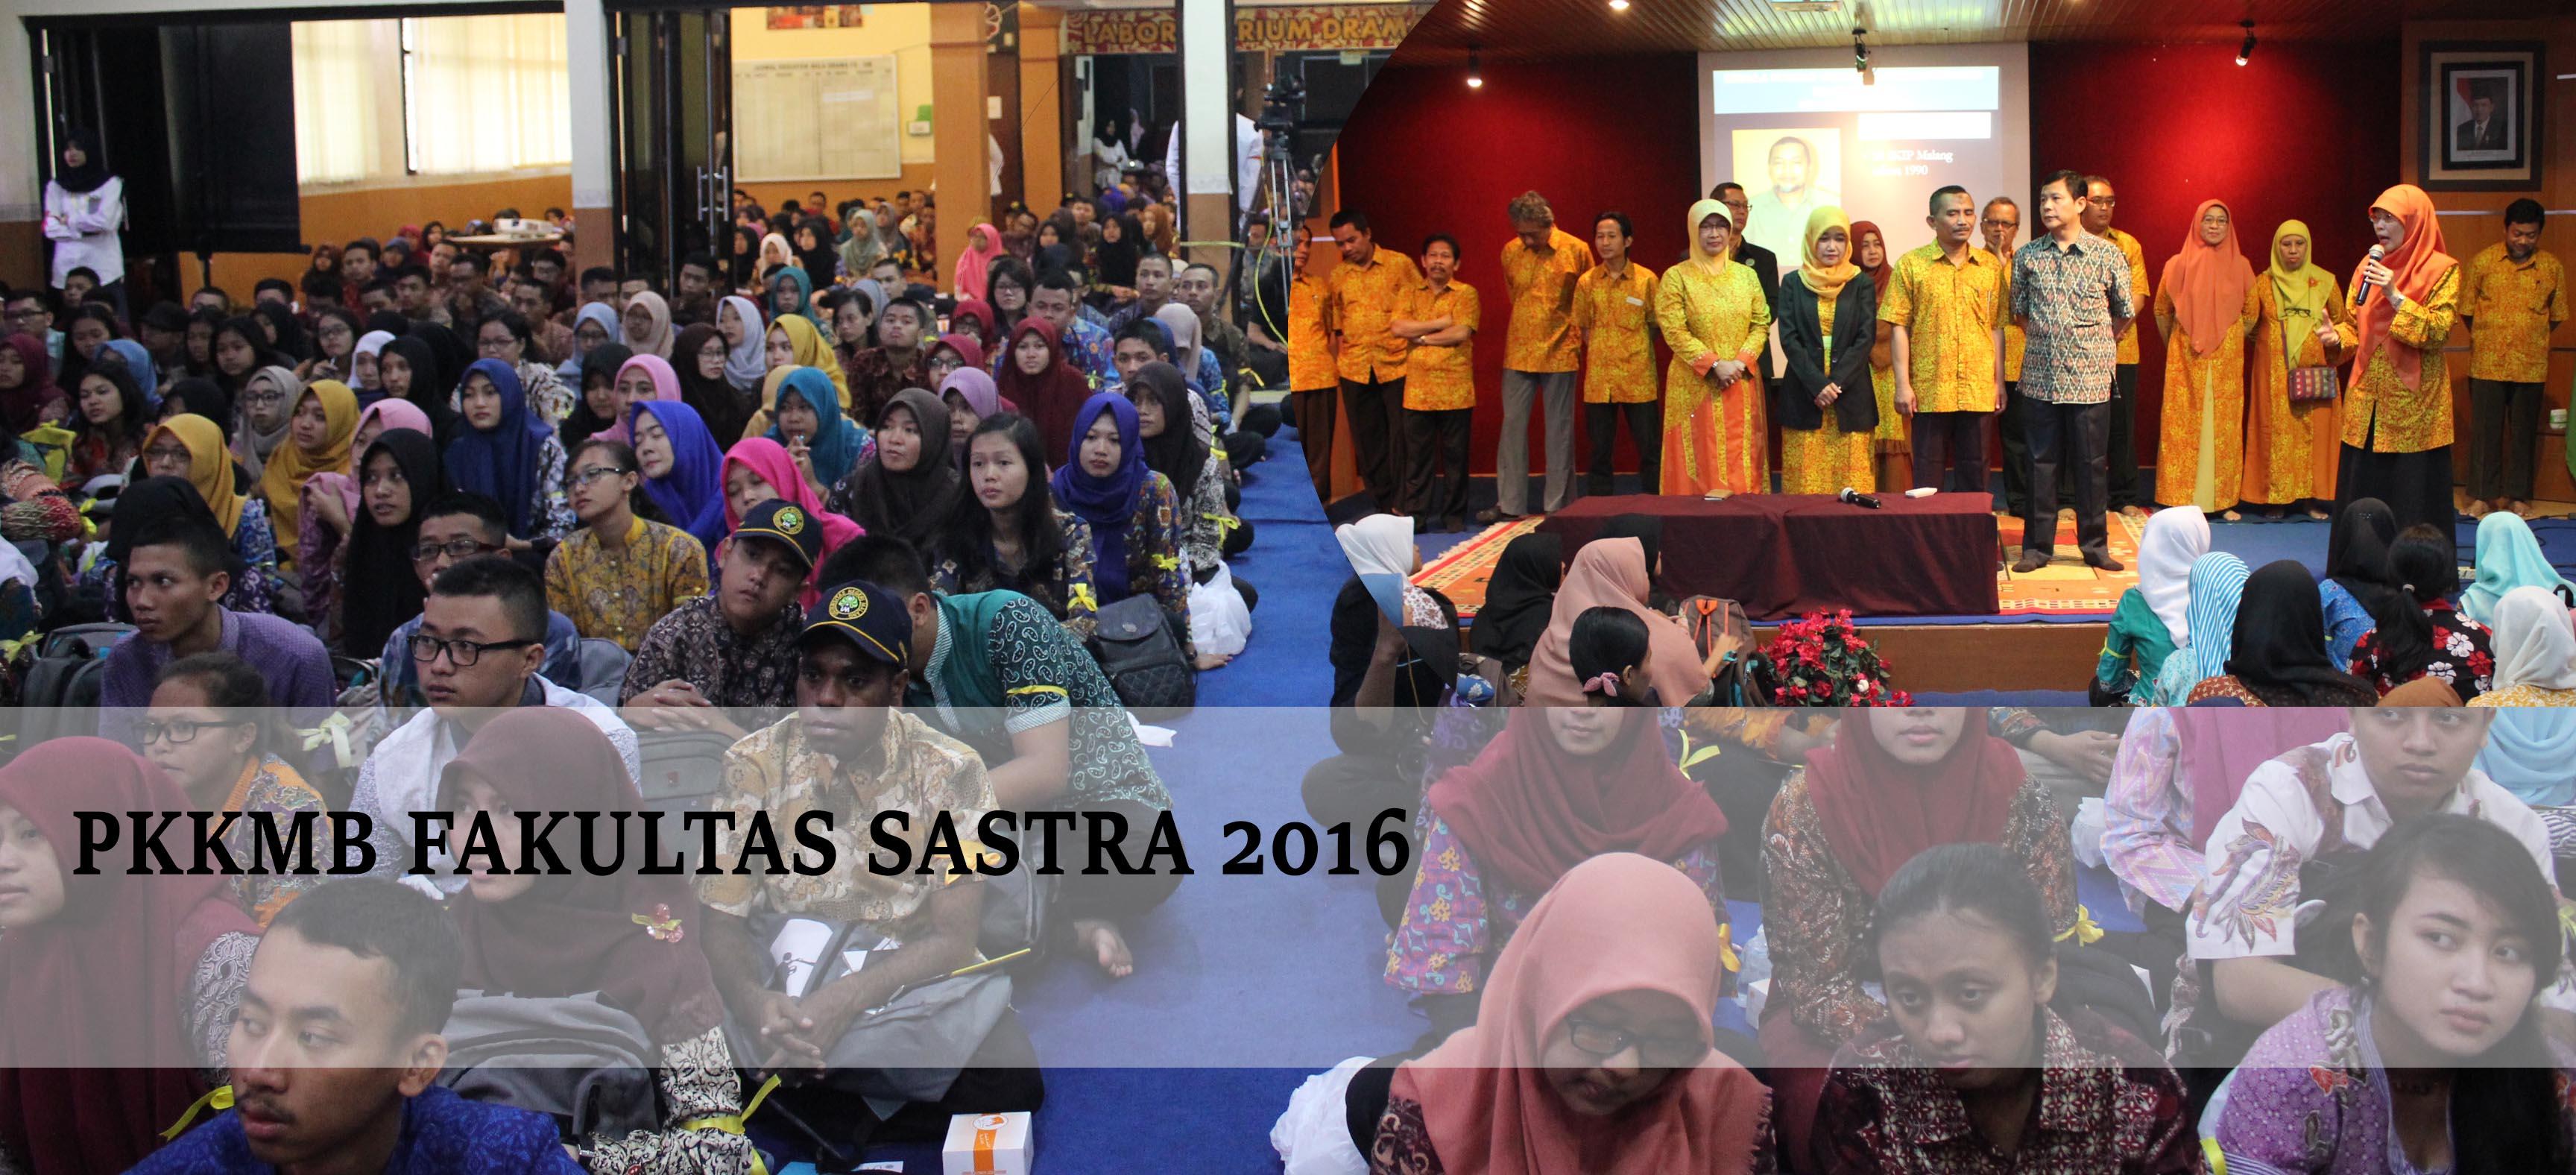 PKKMB FAKULTAS SASTRA 2016 di Aula Fakultas Sastra